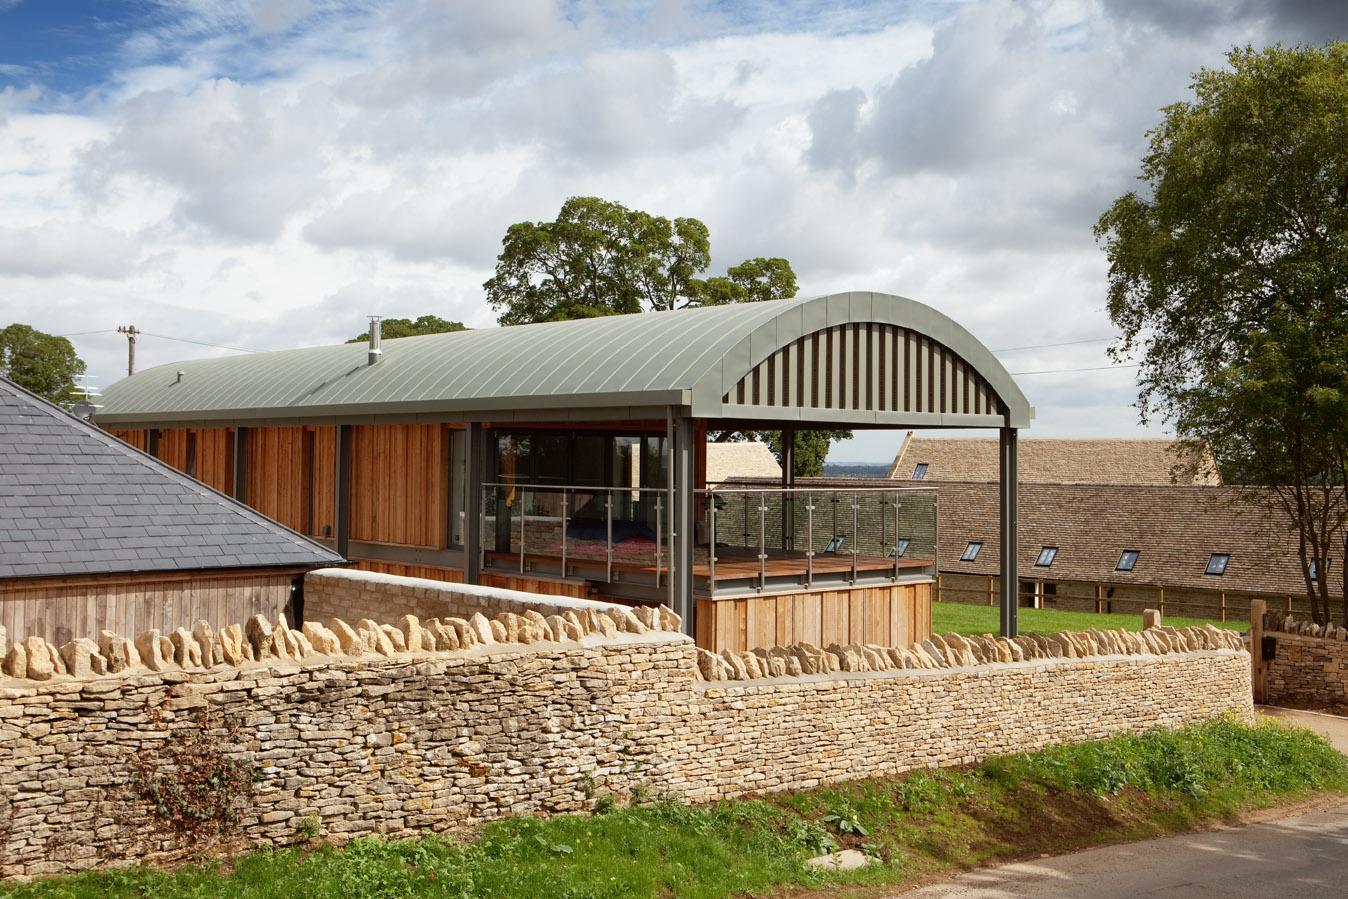 Manor Farm Barns Metalex Roofing Ltd